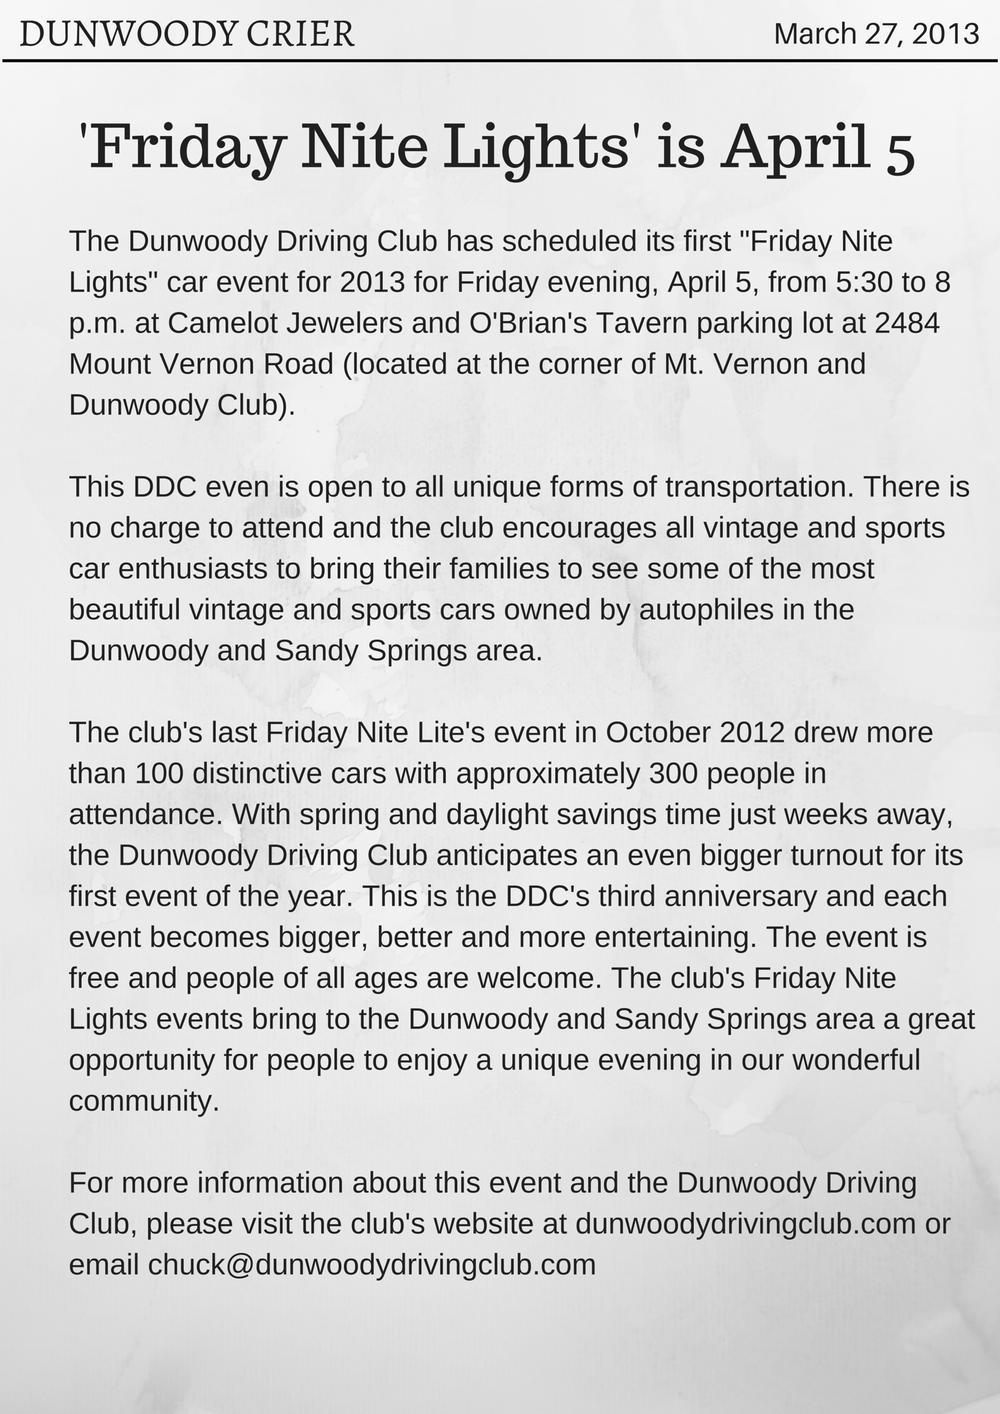 'Friday Nite Lites' is April 5 (Dunwoody Crier).png